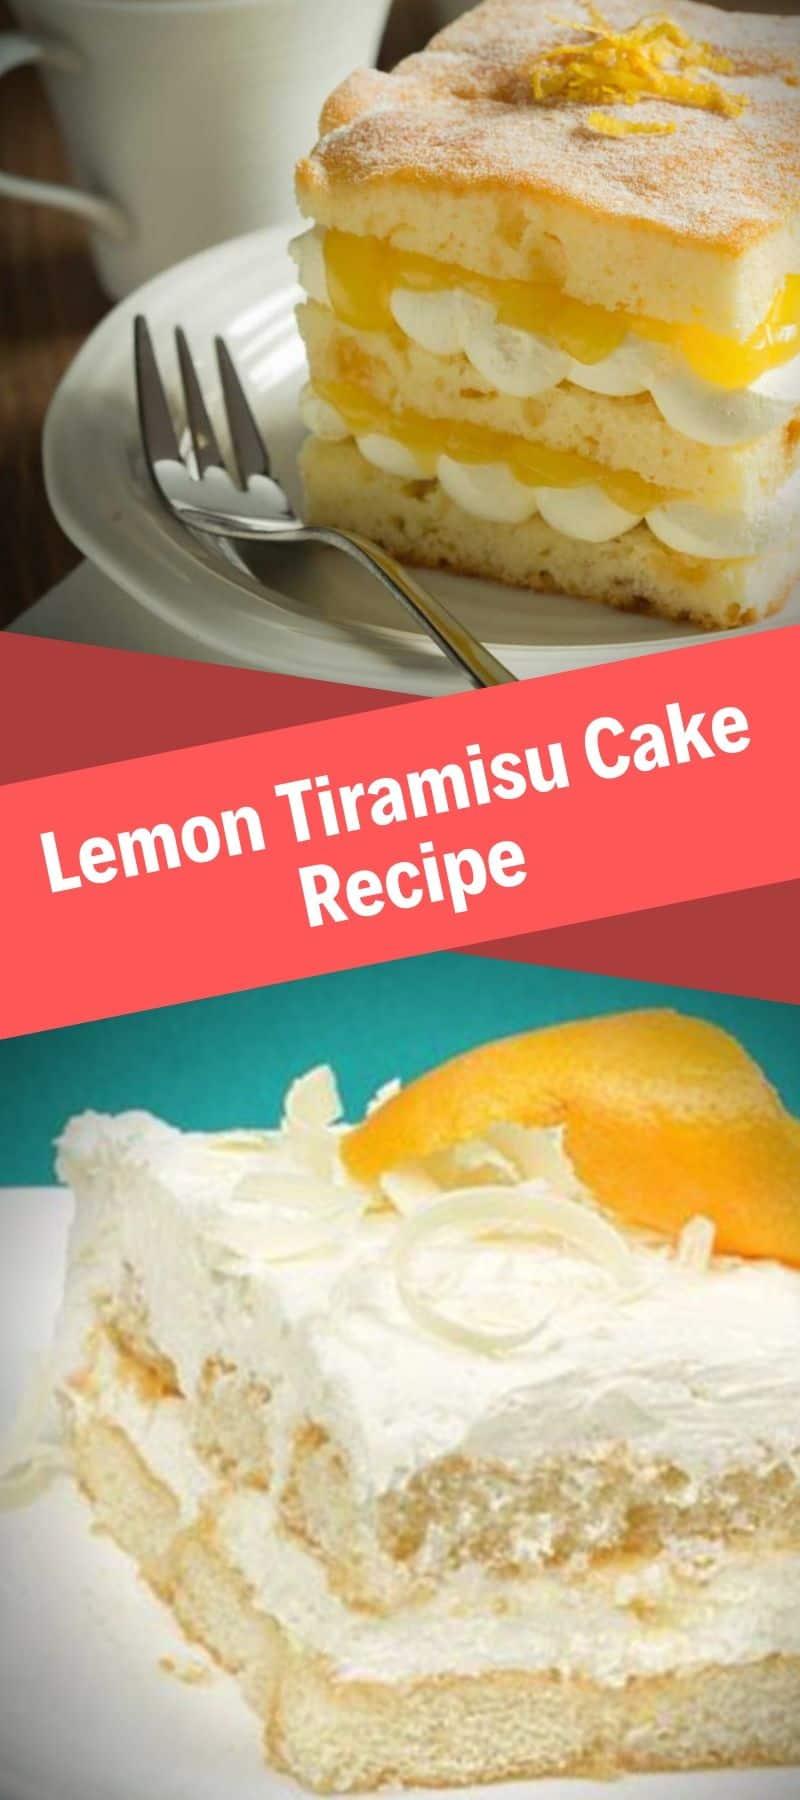 Lemon Tiramisu Cake Recipe 3